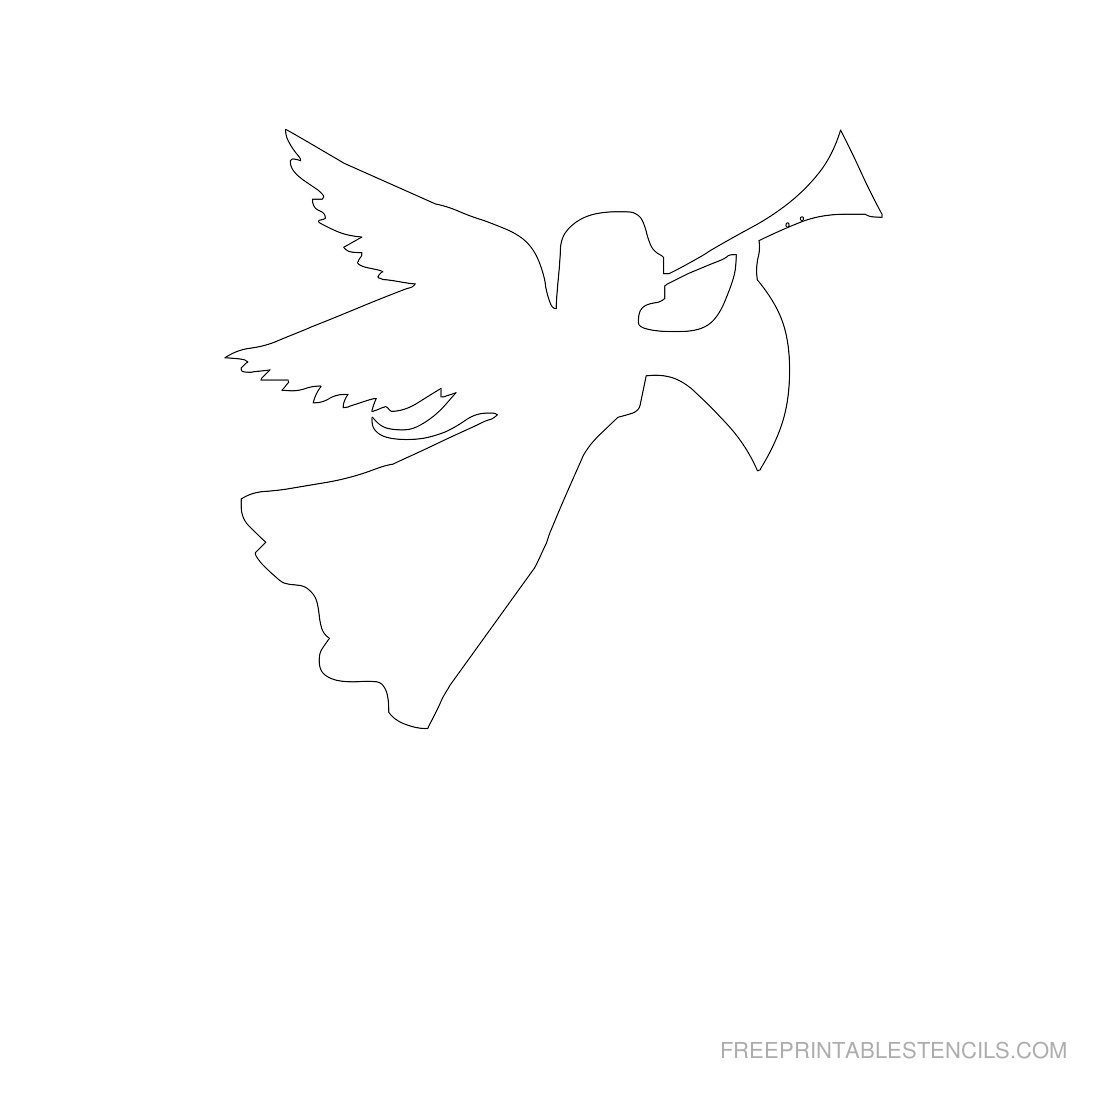 Free Printable Angel Stencils | Free Printable Stencils - Free Printable Pictures Of Angels